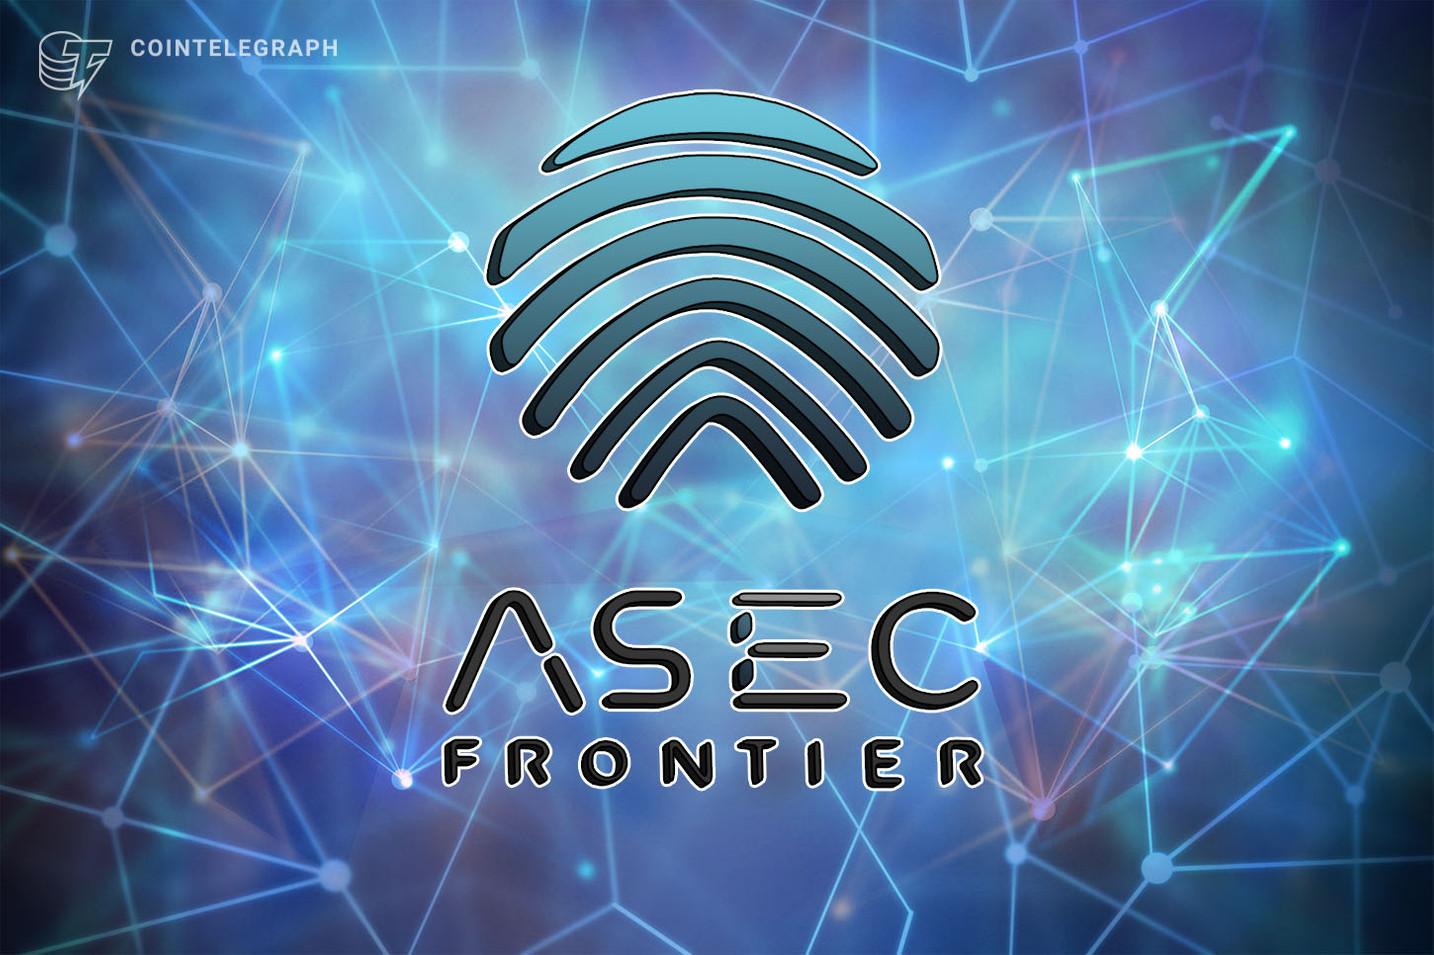 Asec develops an HR distribution platform specialized for the medical industry